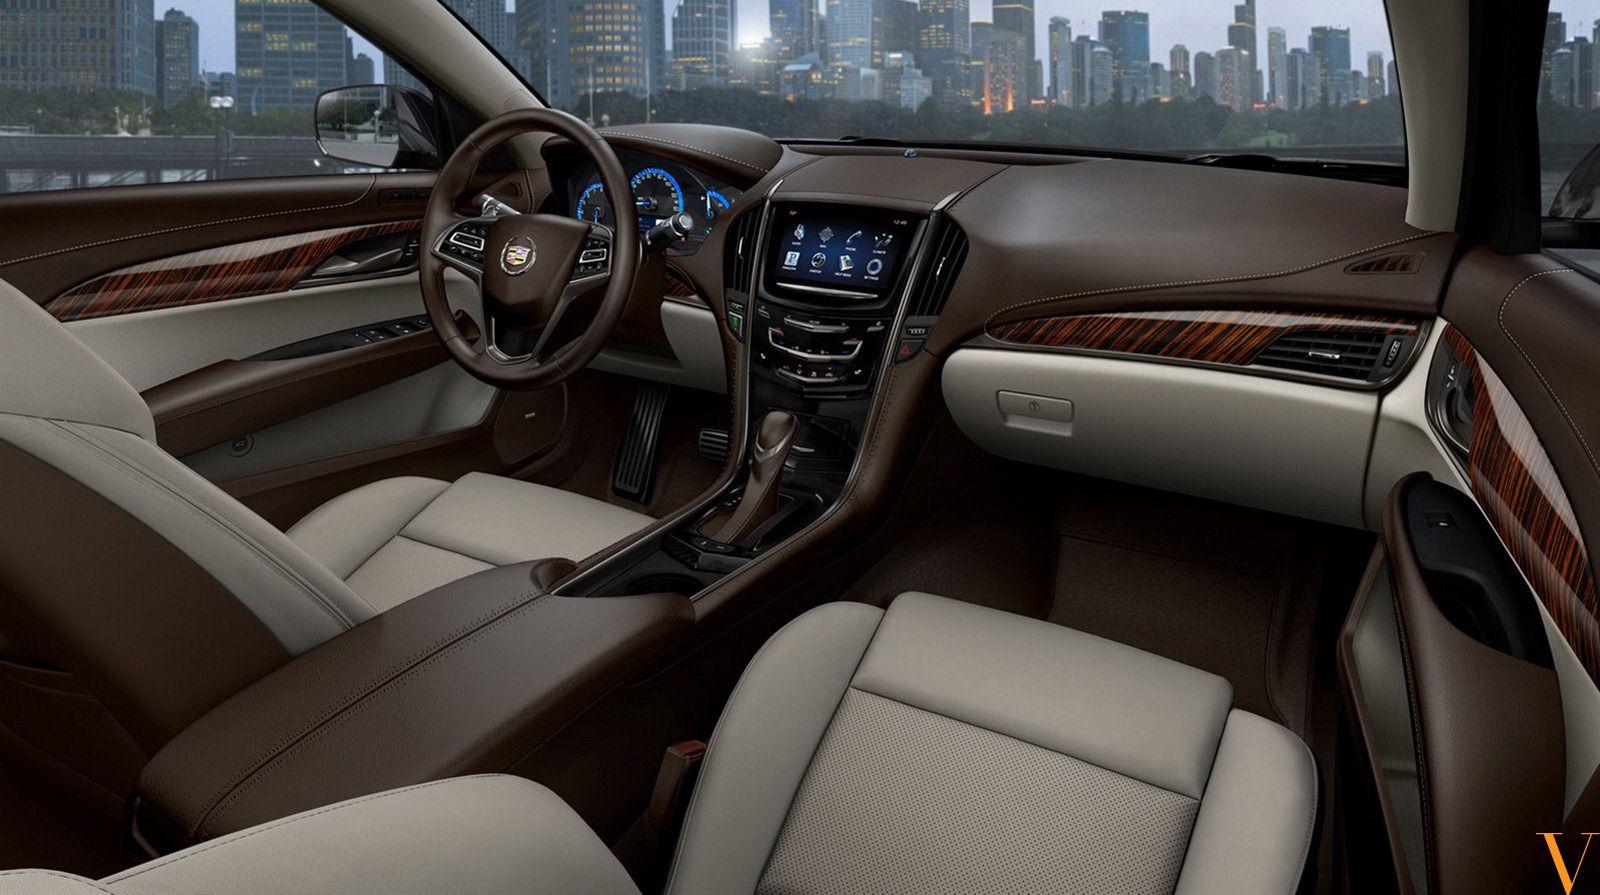 Cadillac debuts 2013 ats compact luxury sports sedan at 2012 north american international auto show